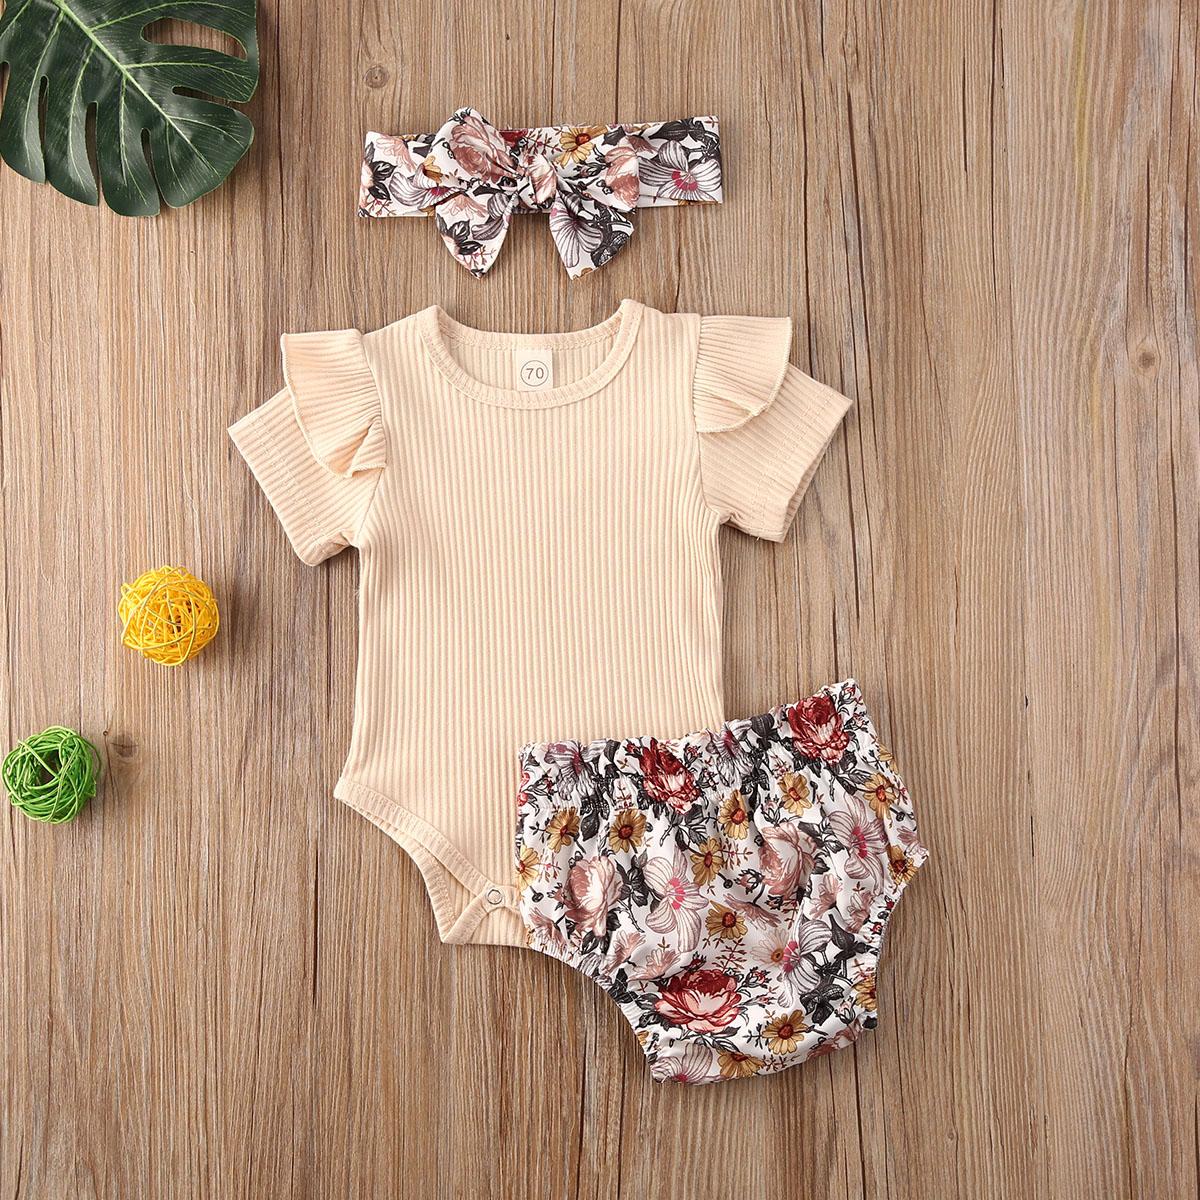 Newborn 3Pcs Solid Color Short Sleeve Printed Shorts Bow Tie Elastic Waist Summer Baby Clothing Set 0-24M